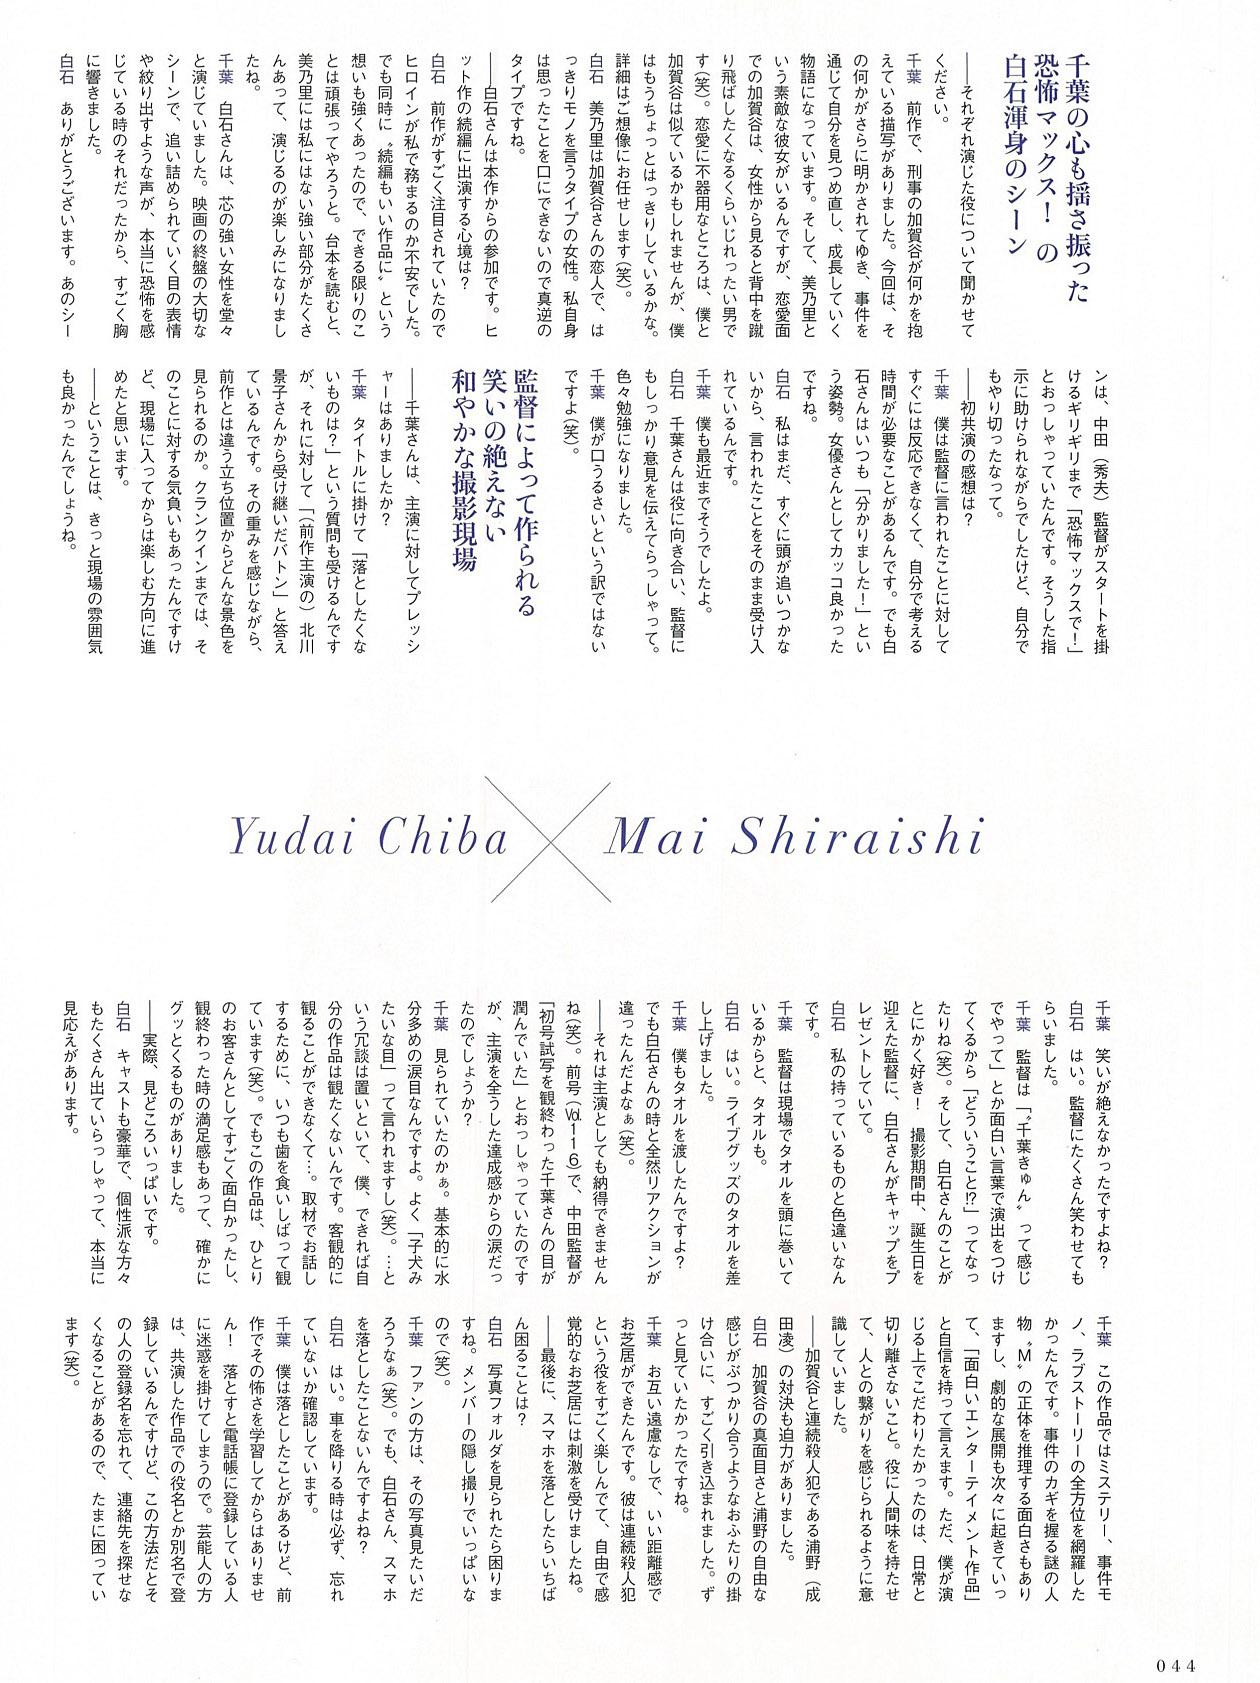 MShiraishi Cinema Square 02.jpg